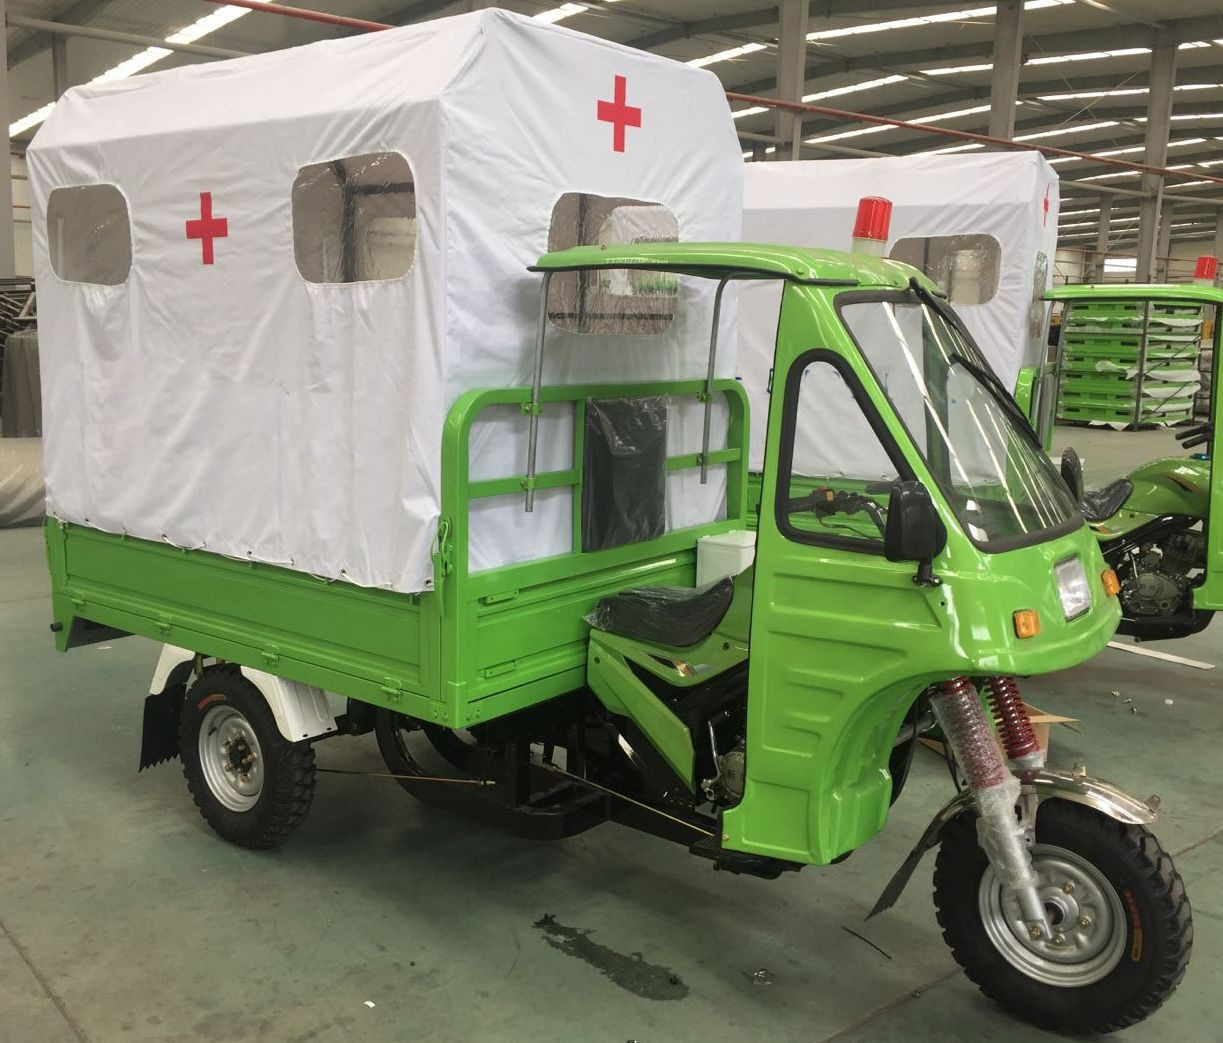 150cc petrol engine tricycle ambulance